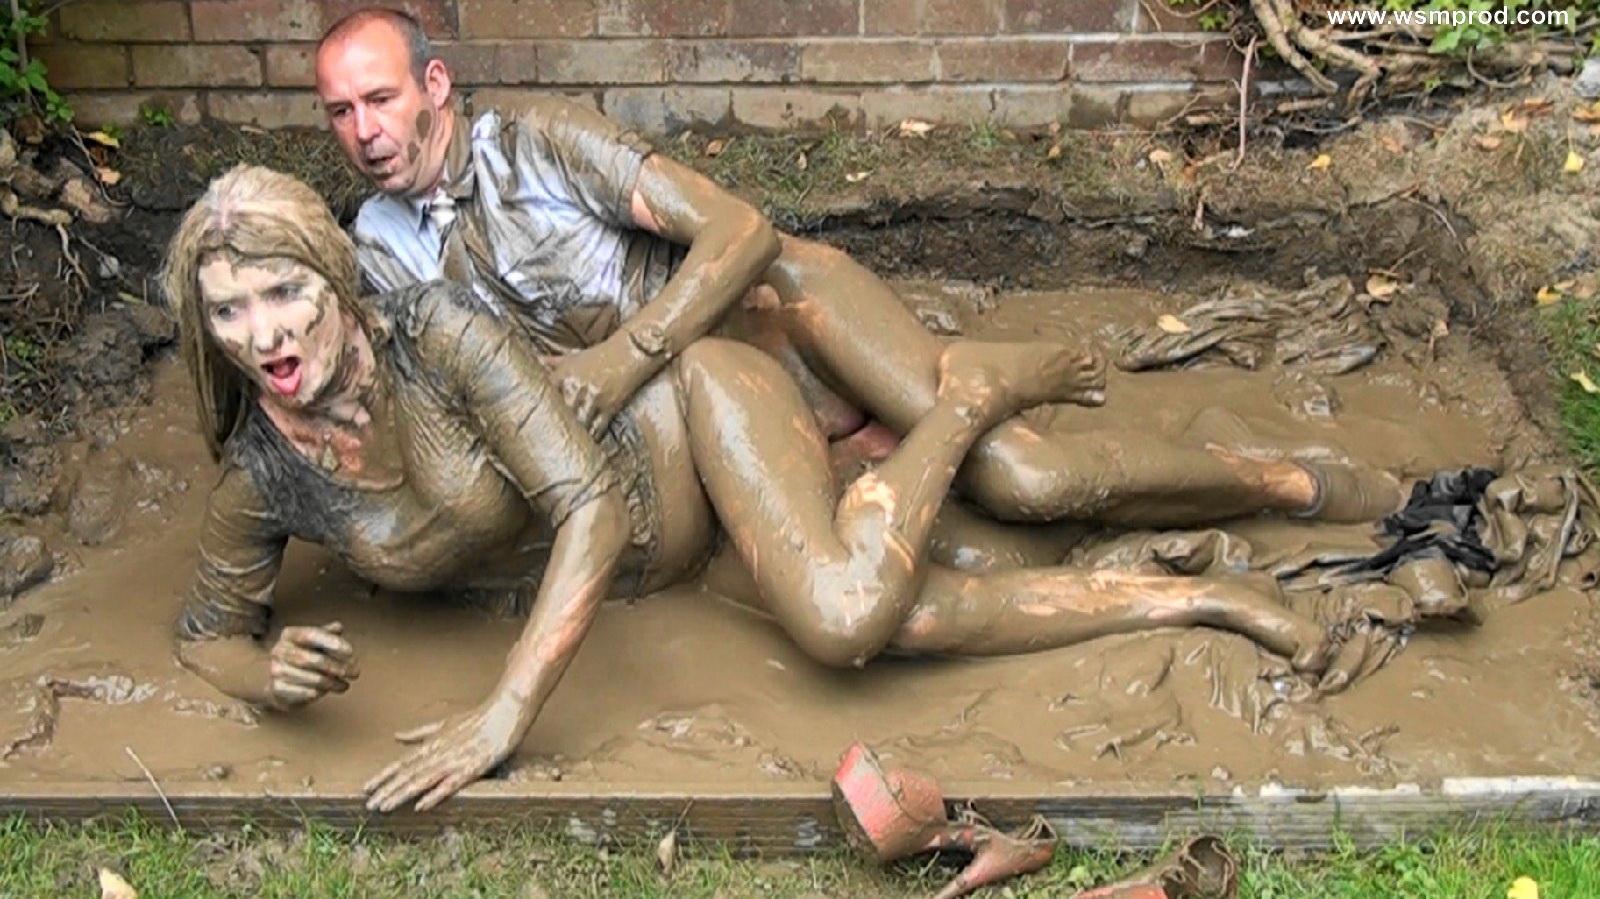 Русский секс в грязи, В грязи - бесплатное онлайн порно на сайте TopPorno 24 фотография